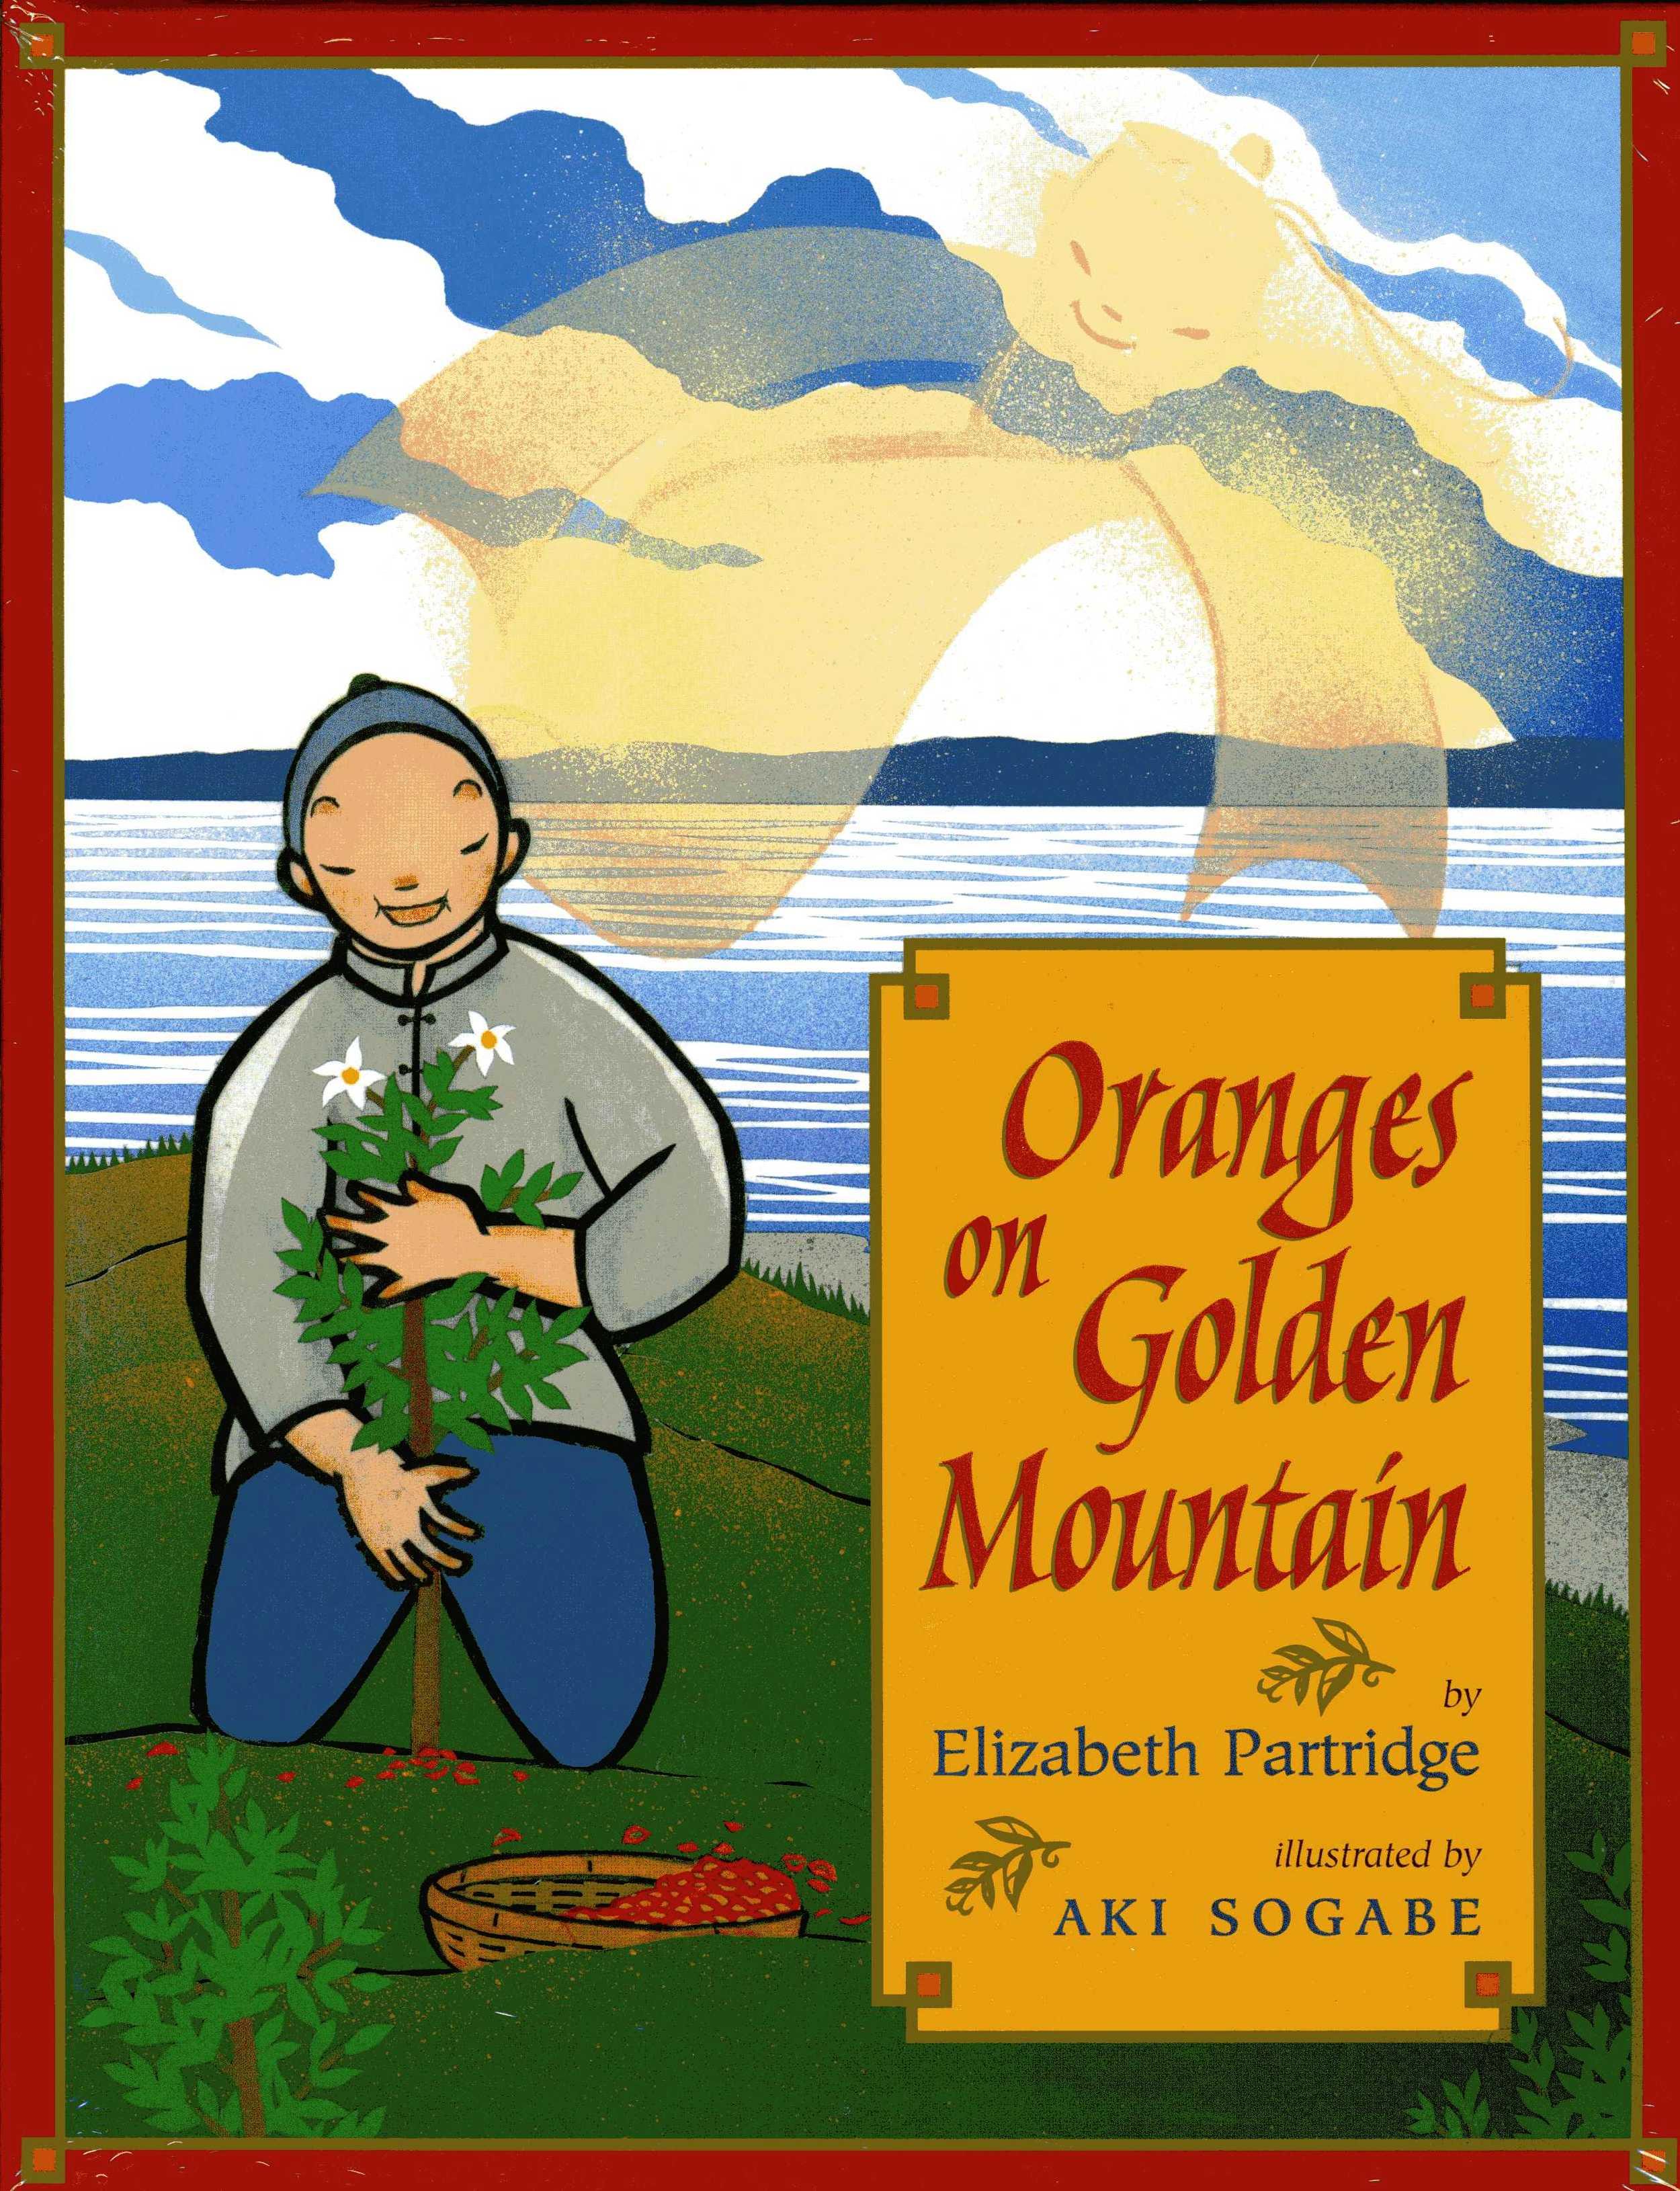 Elizabeth Partridge - Oranges on Golden Mountain.jpg